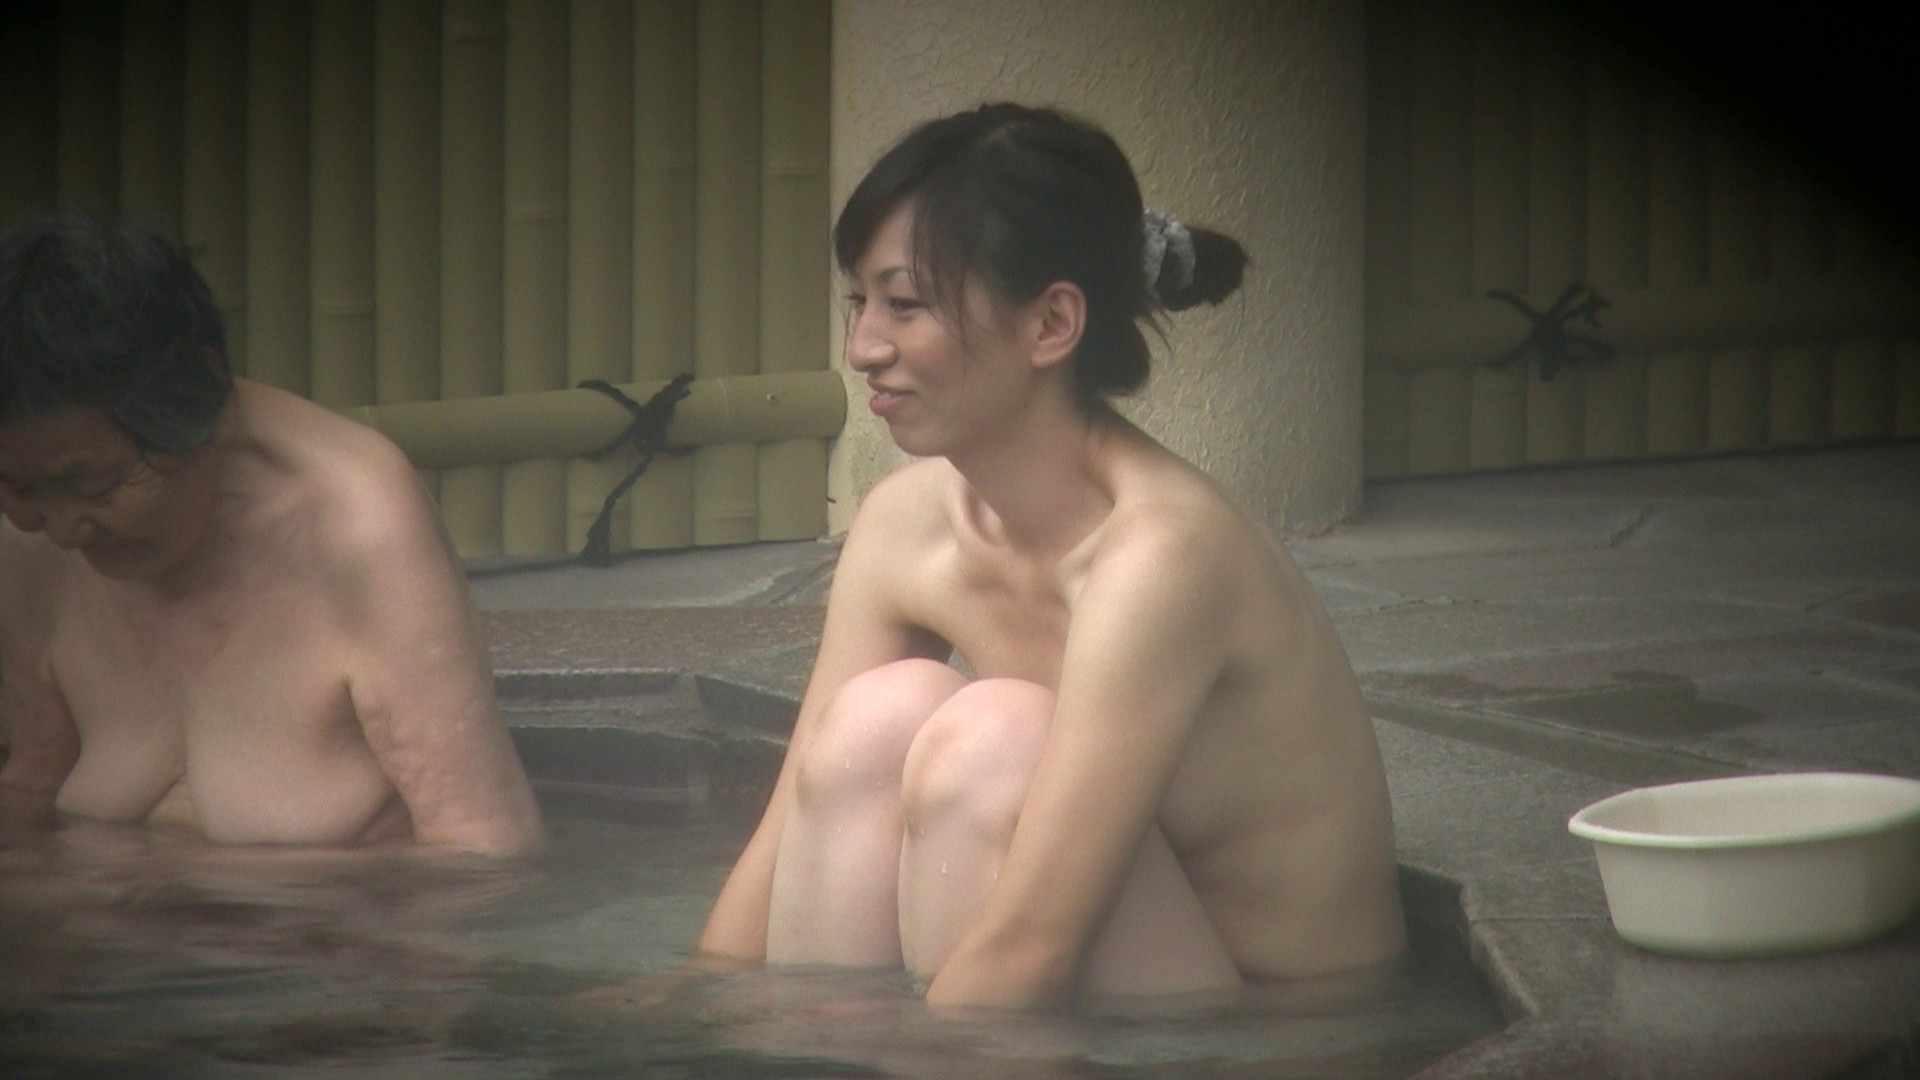 Aquaな露天風呂Vol.156 露天覗き おめこ無修正動画無料 22枚